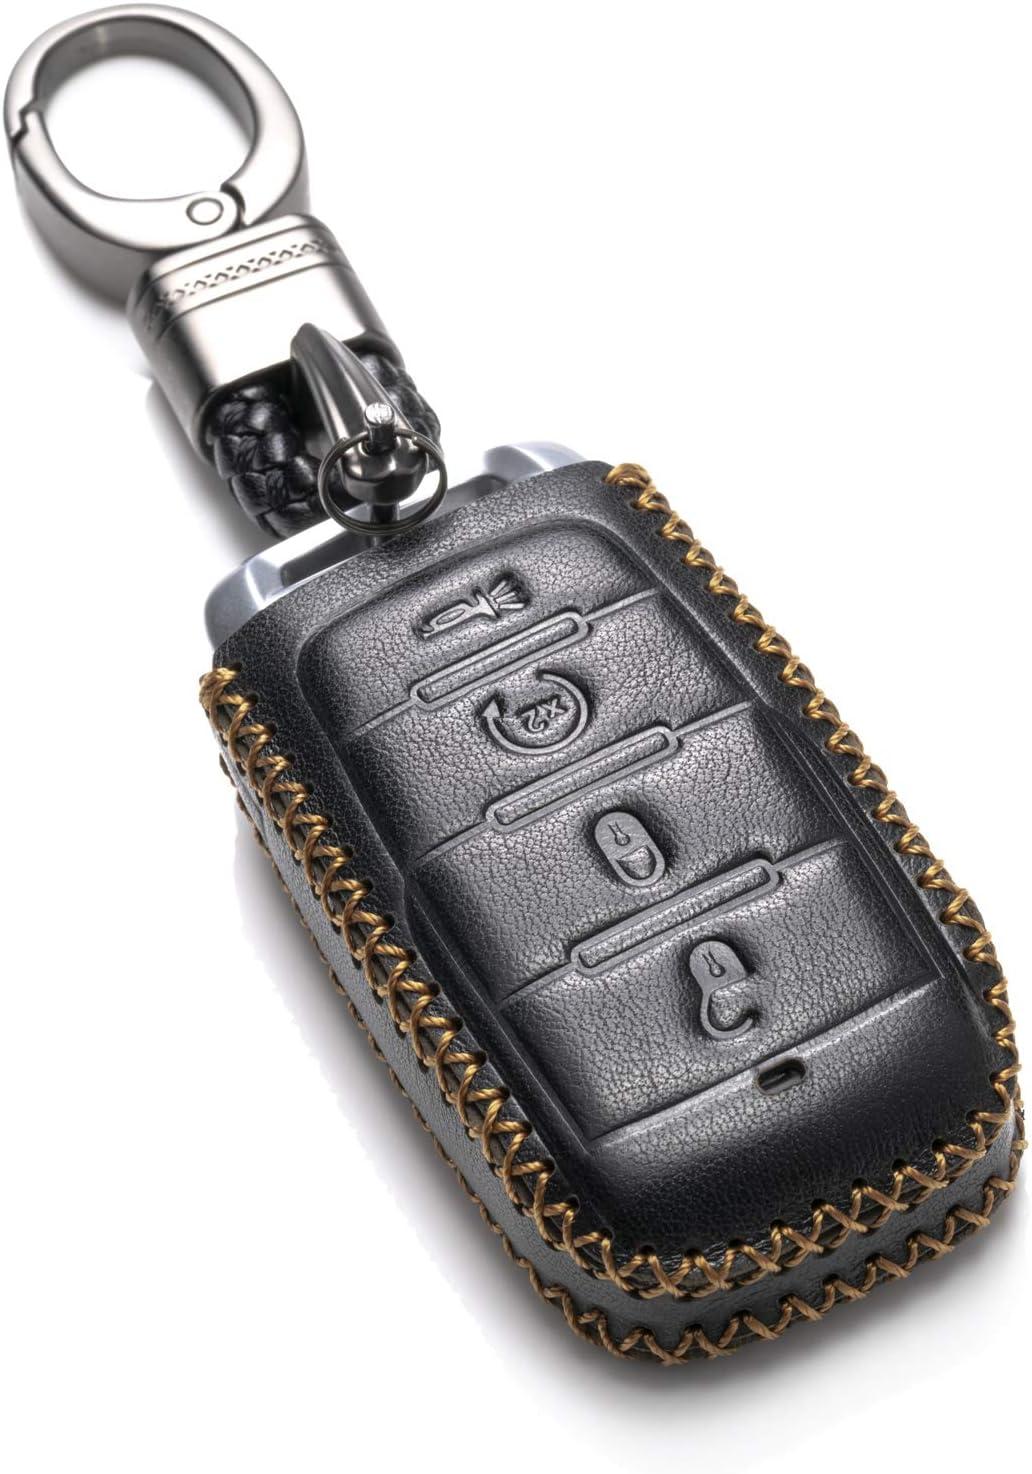 Award Vitodeco Genuine shipfree Leather Keyless Entry Key Smart Remote Control